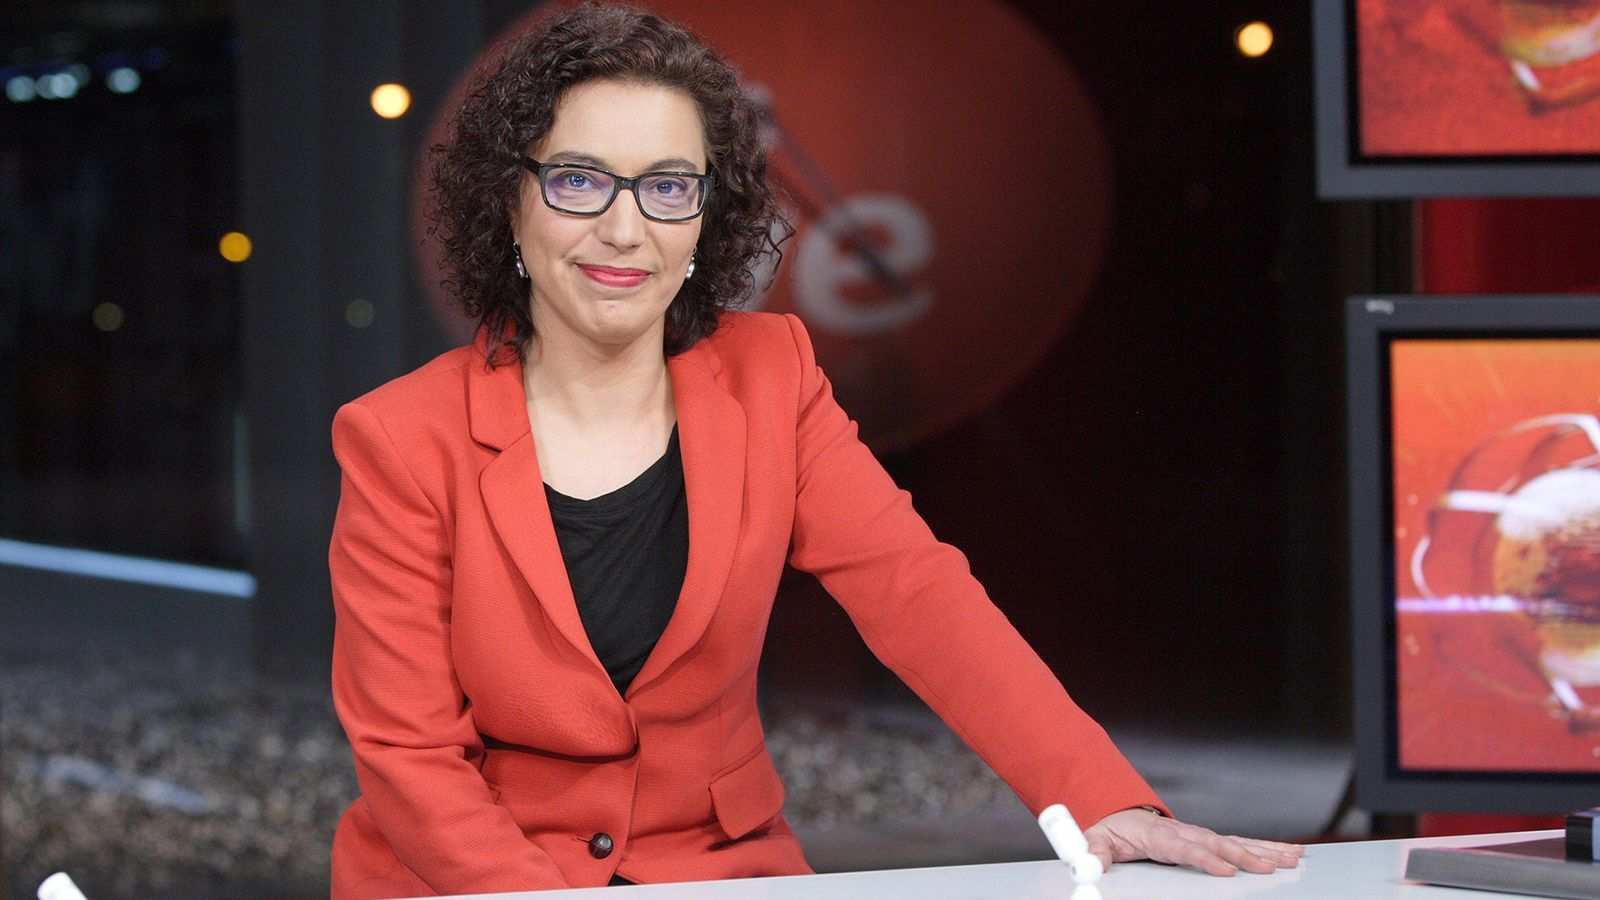 Carolina Pecharromán serà l'editora d'igualtat de TVE